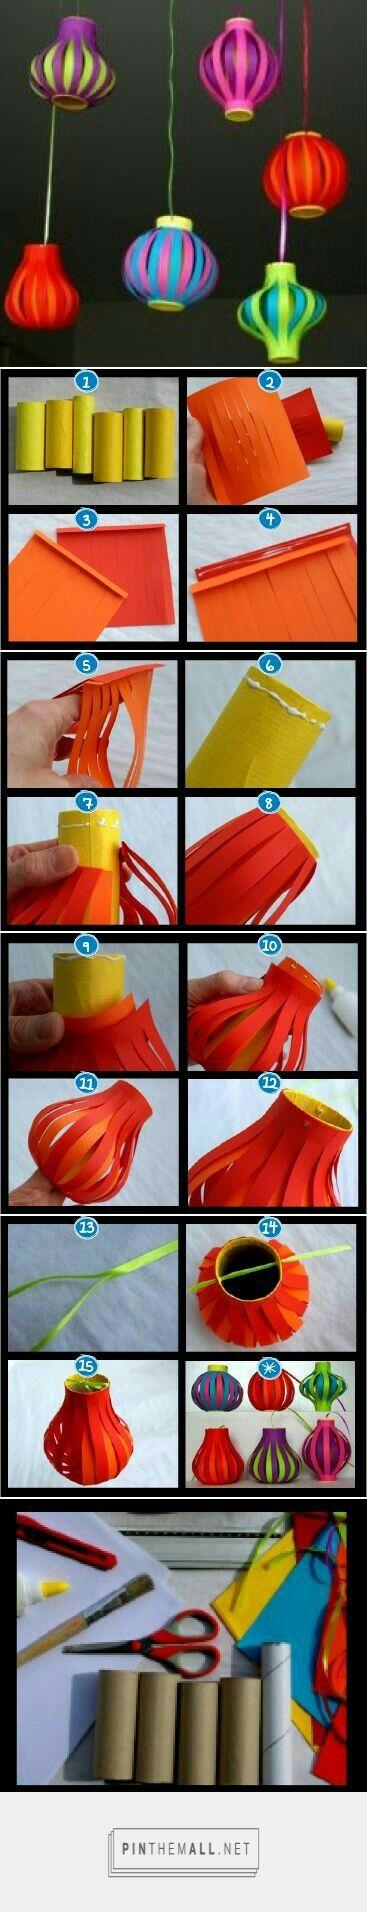 Lanternas de papel